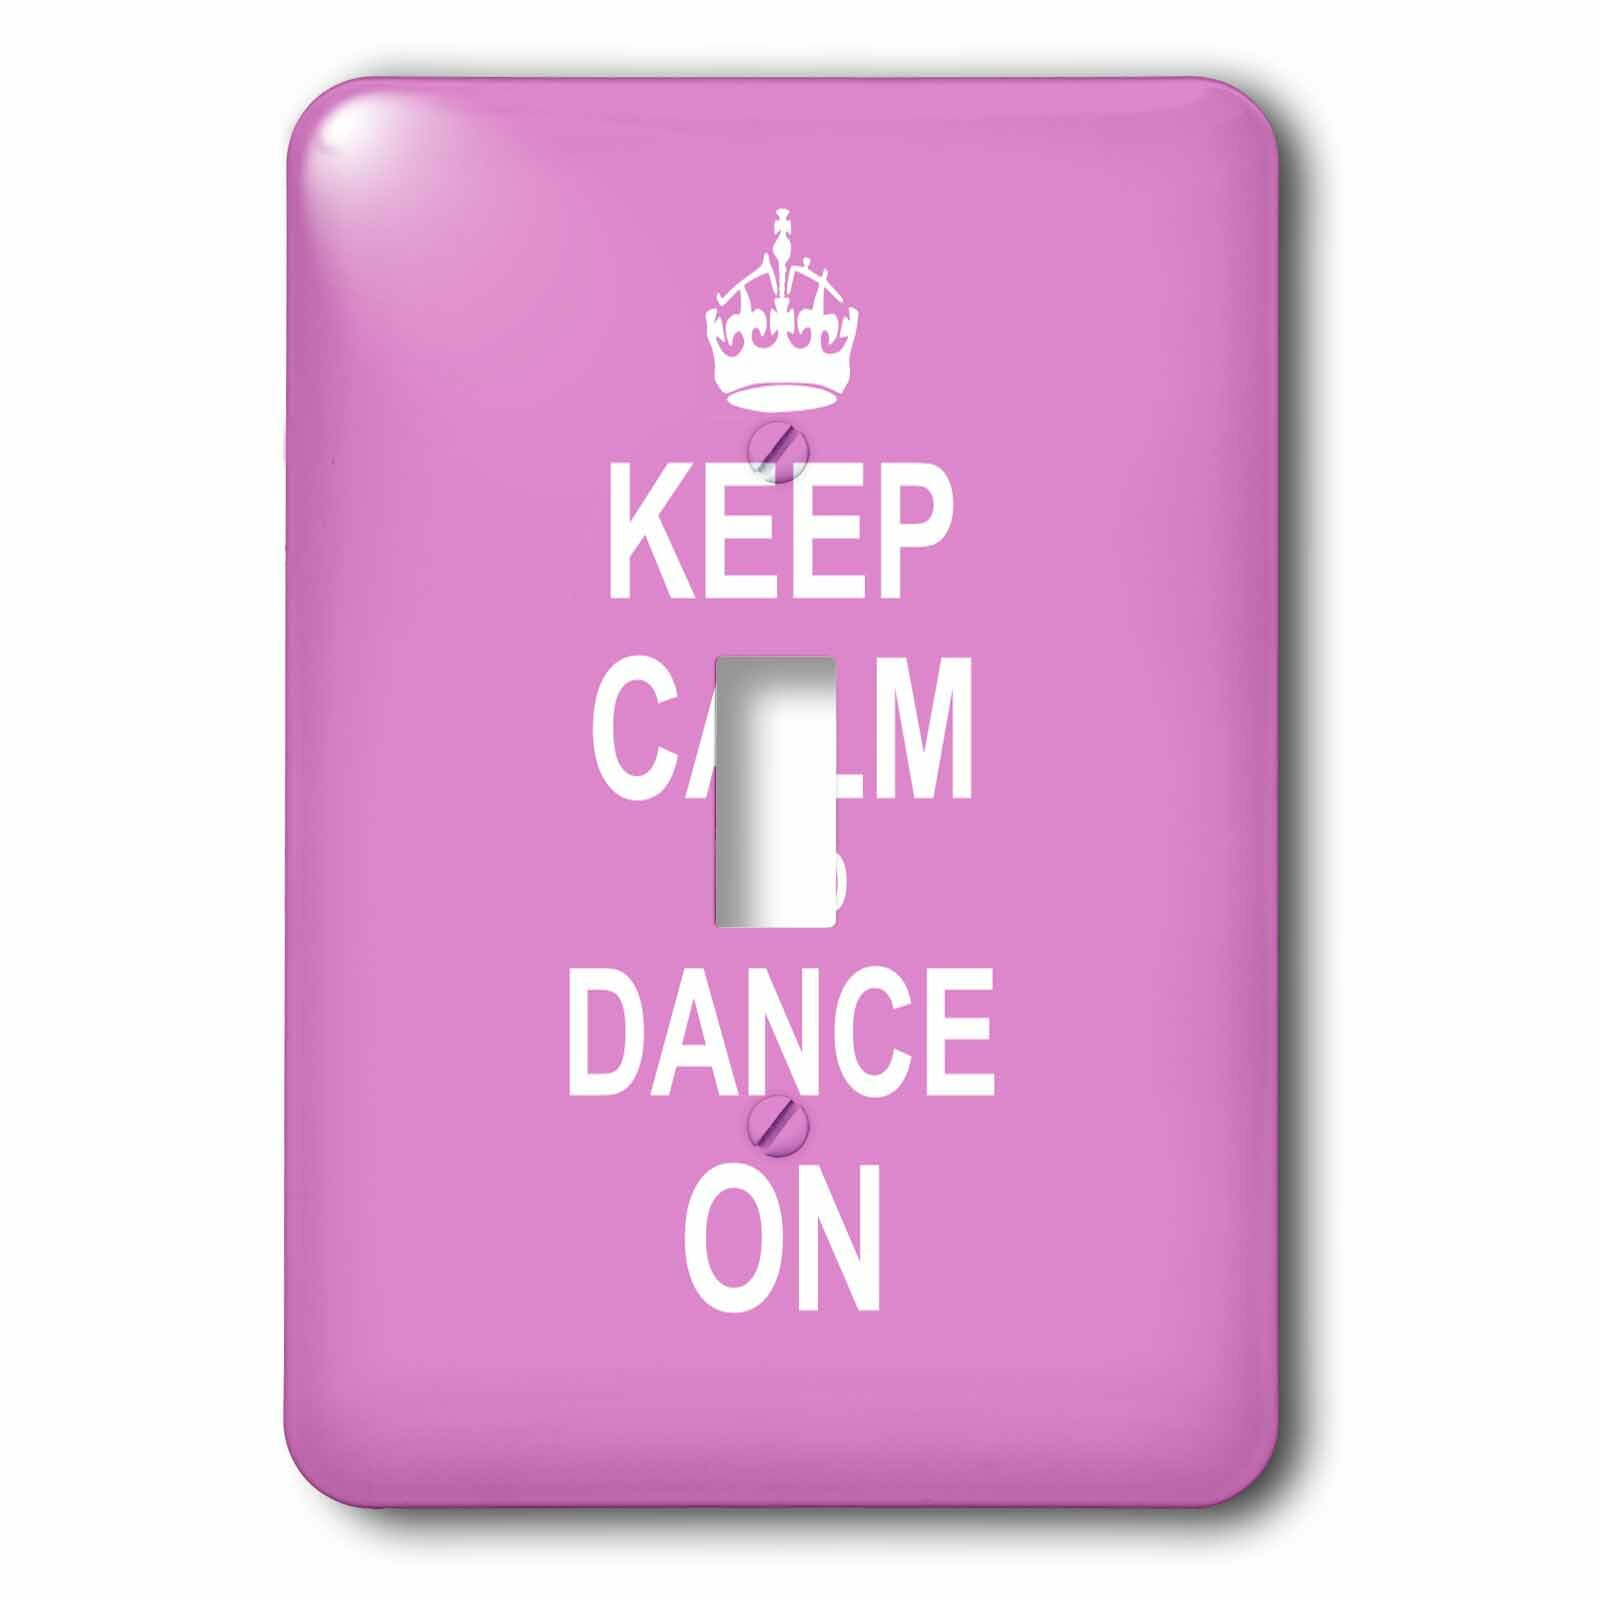 3drose Keep Calm And Dance 1 Gang Toggle Light Switch Wall Plate Wayfair